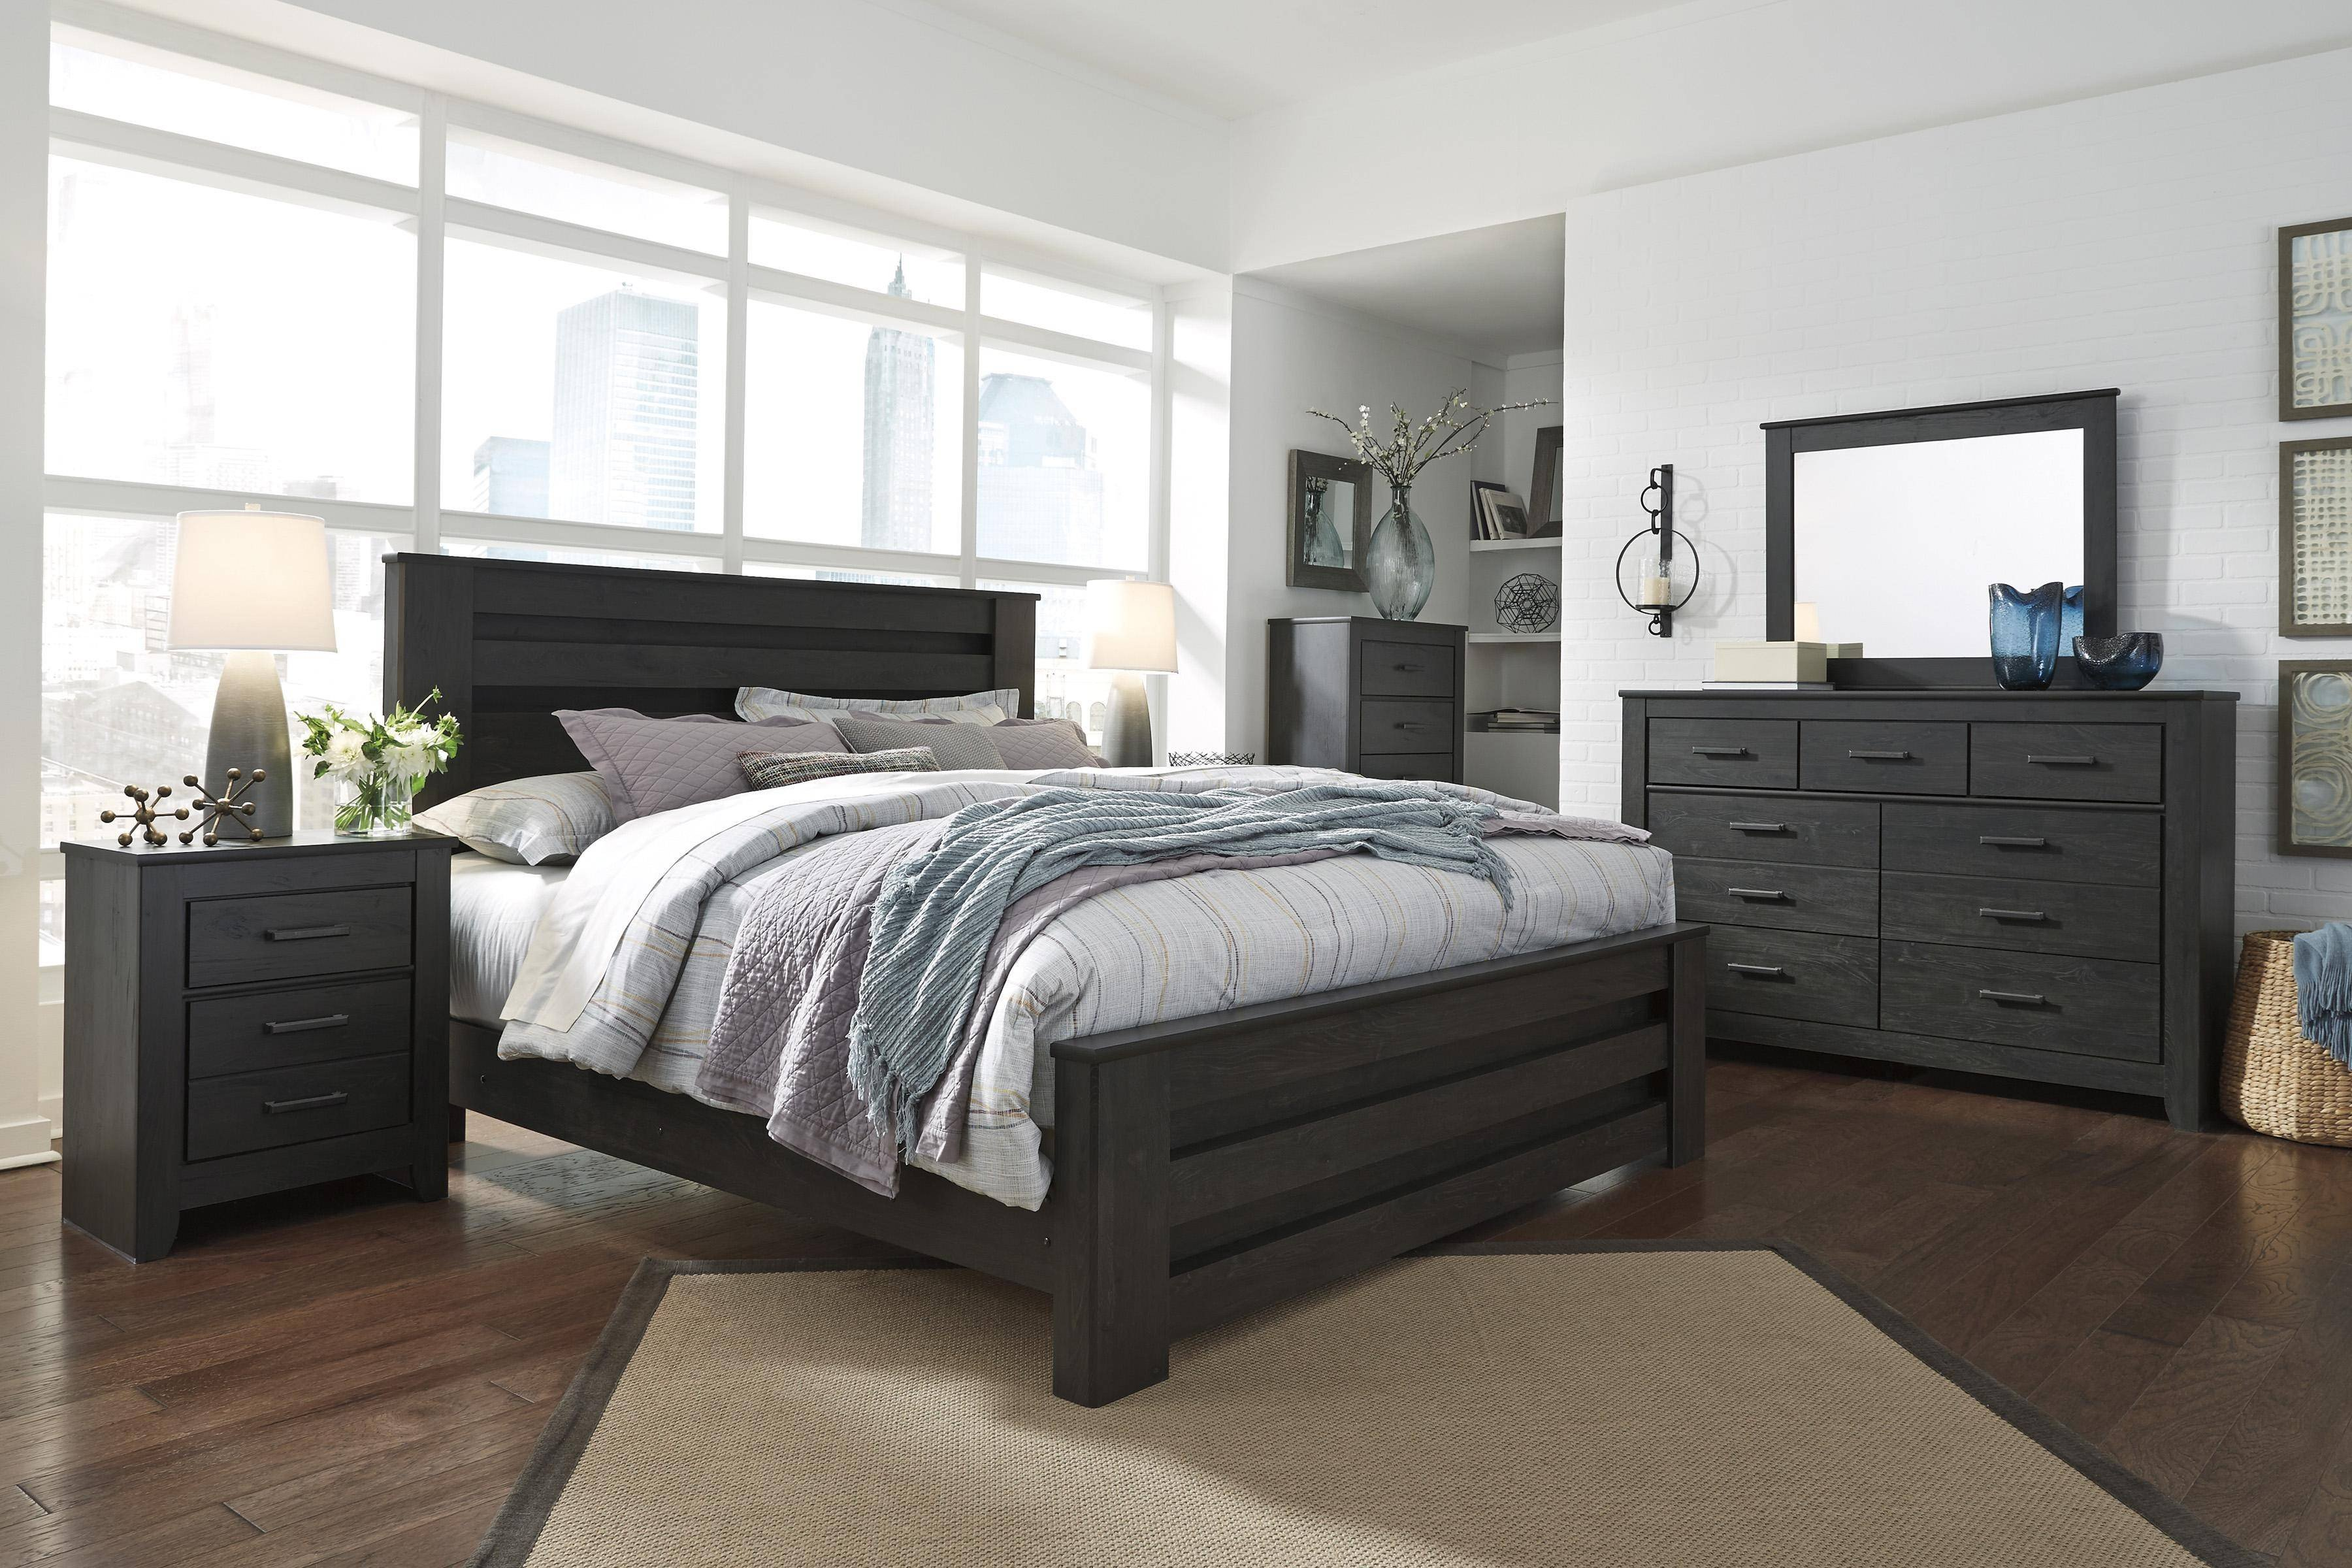 Ashley White Bedroom Furniture Fresh ashley Brinxton B249 King Size Platform Bedroom Set 5pcs In